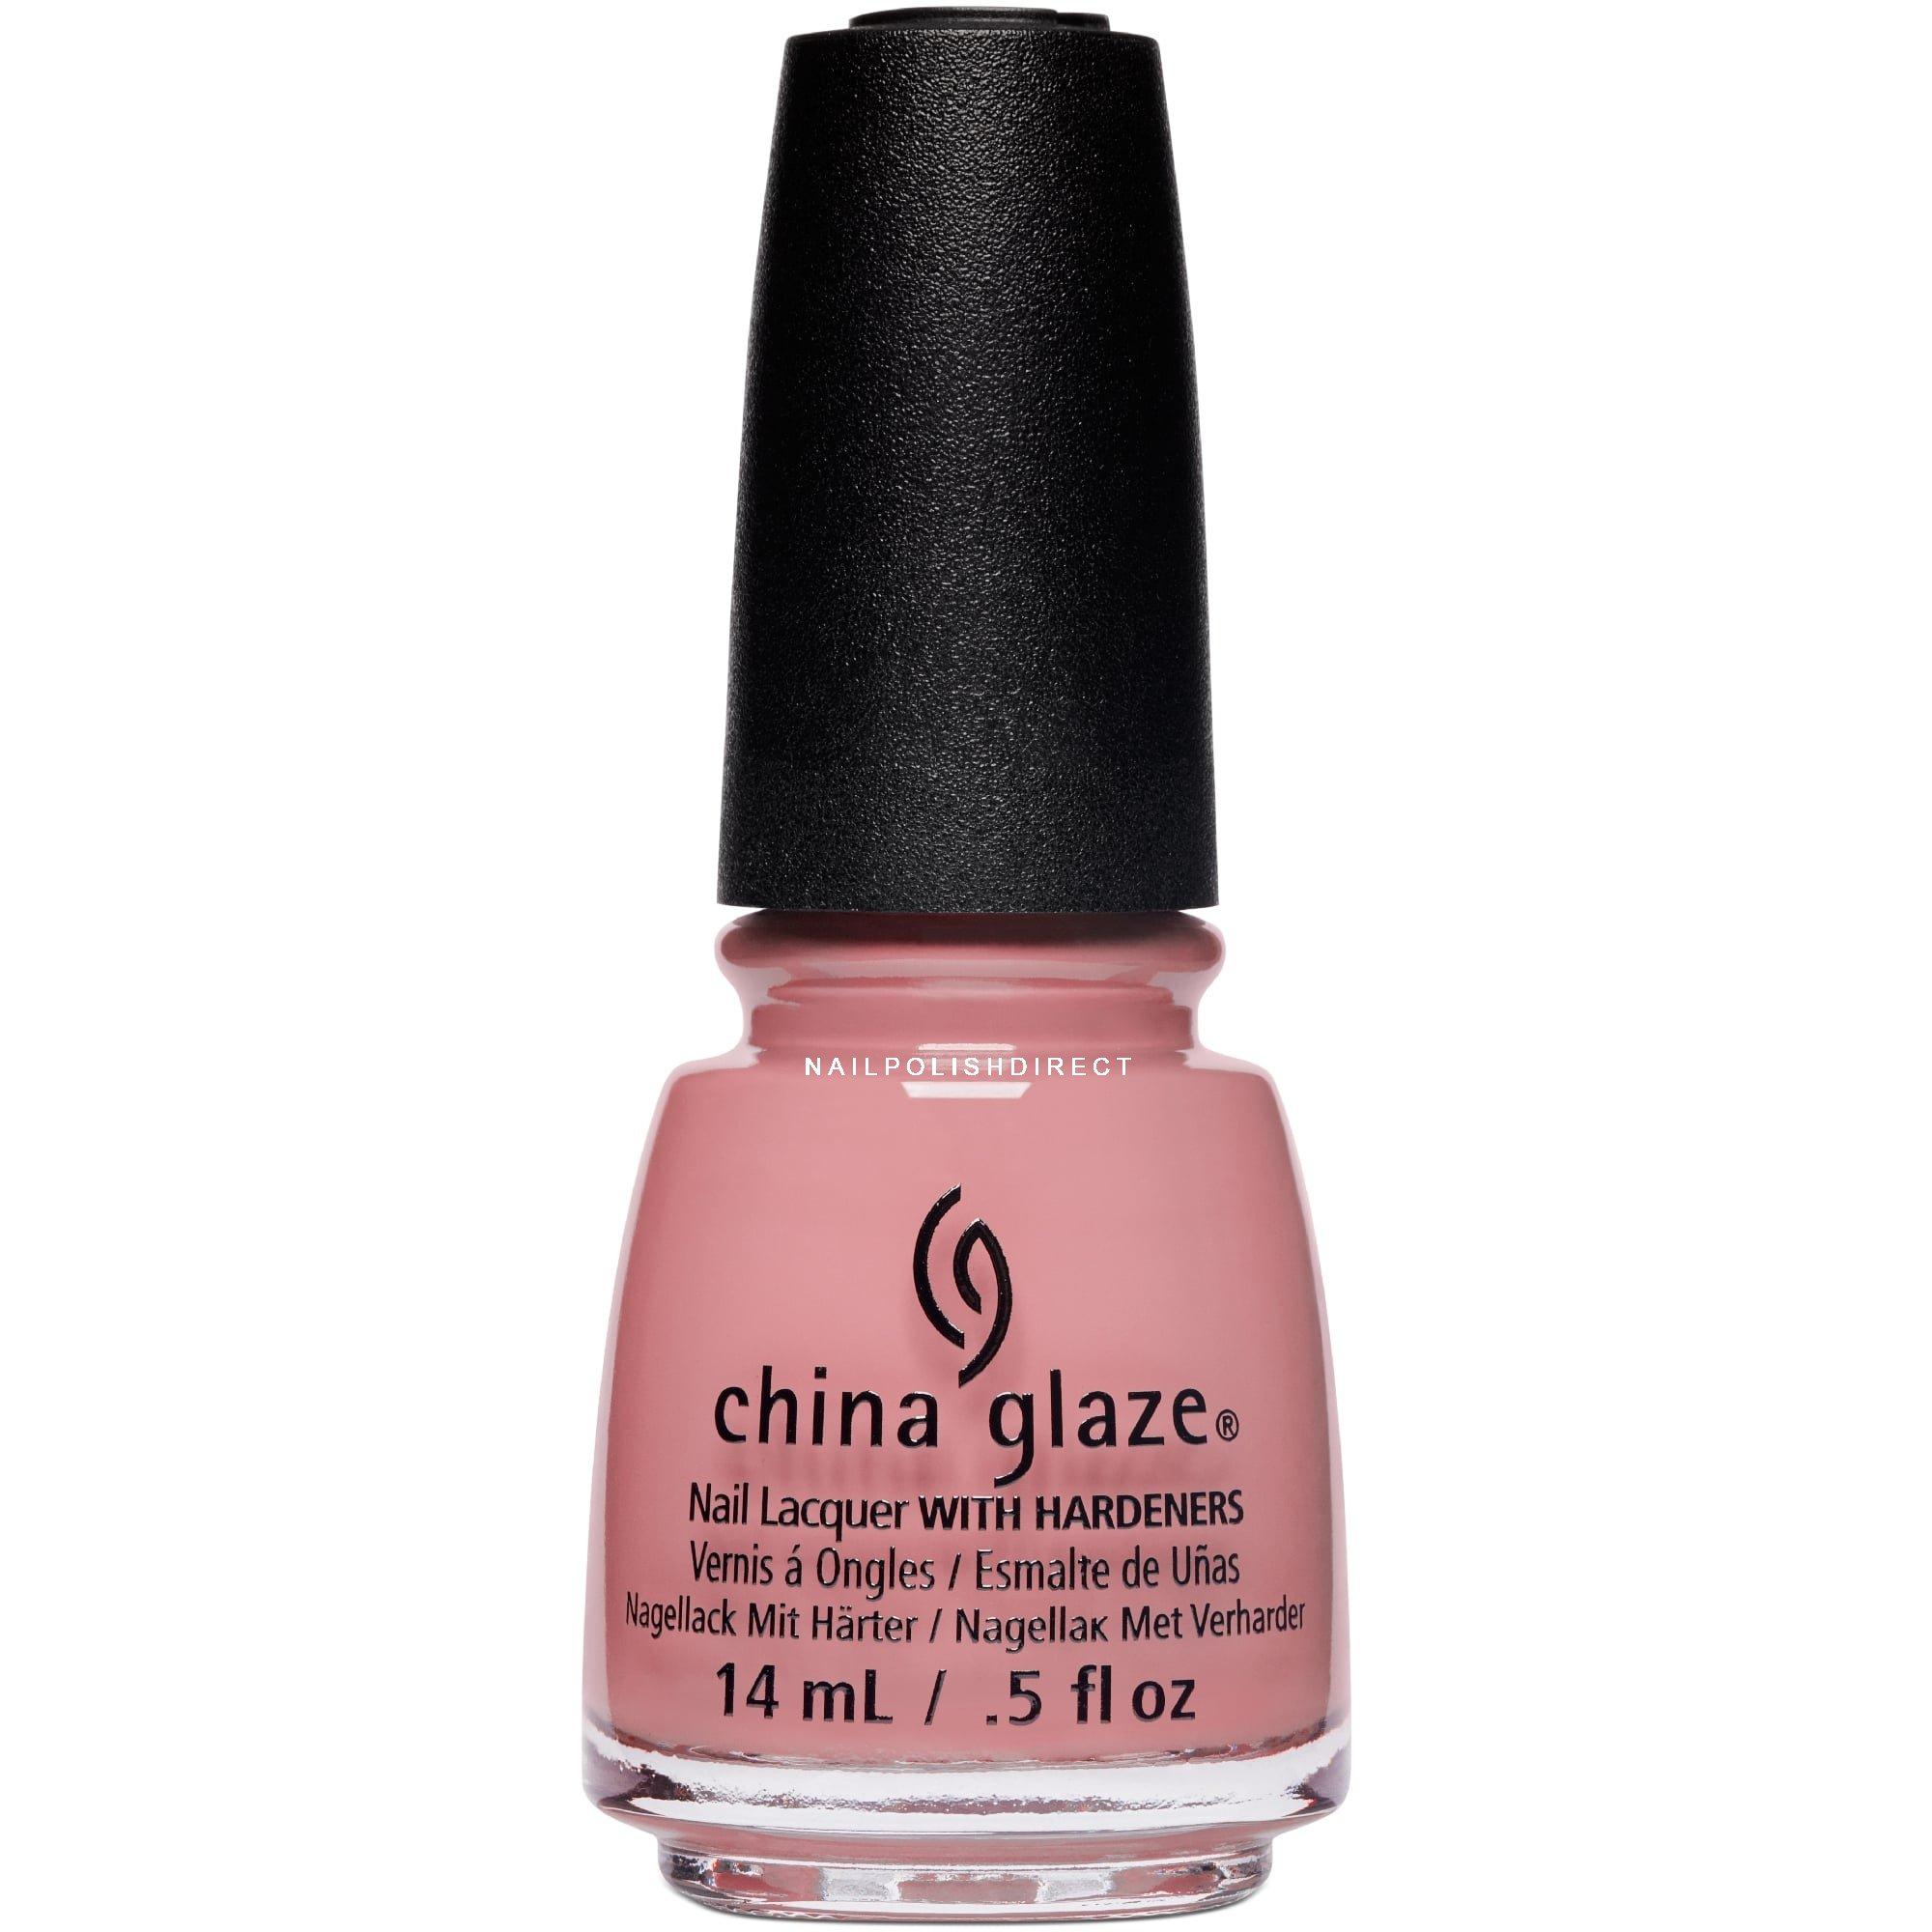 China Glaze Nudes Spring Nail Polish Collection - Don\'t Make Me Blush